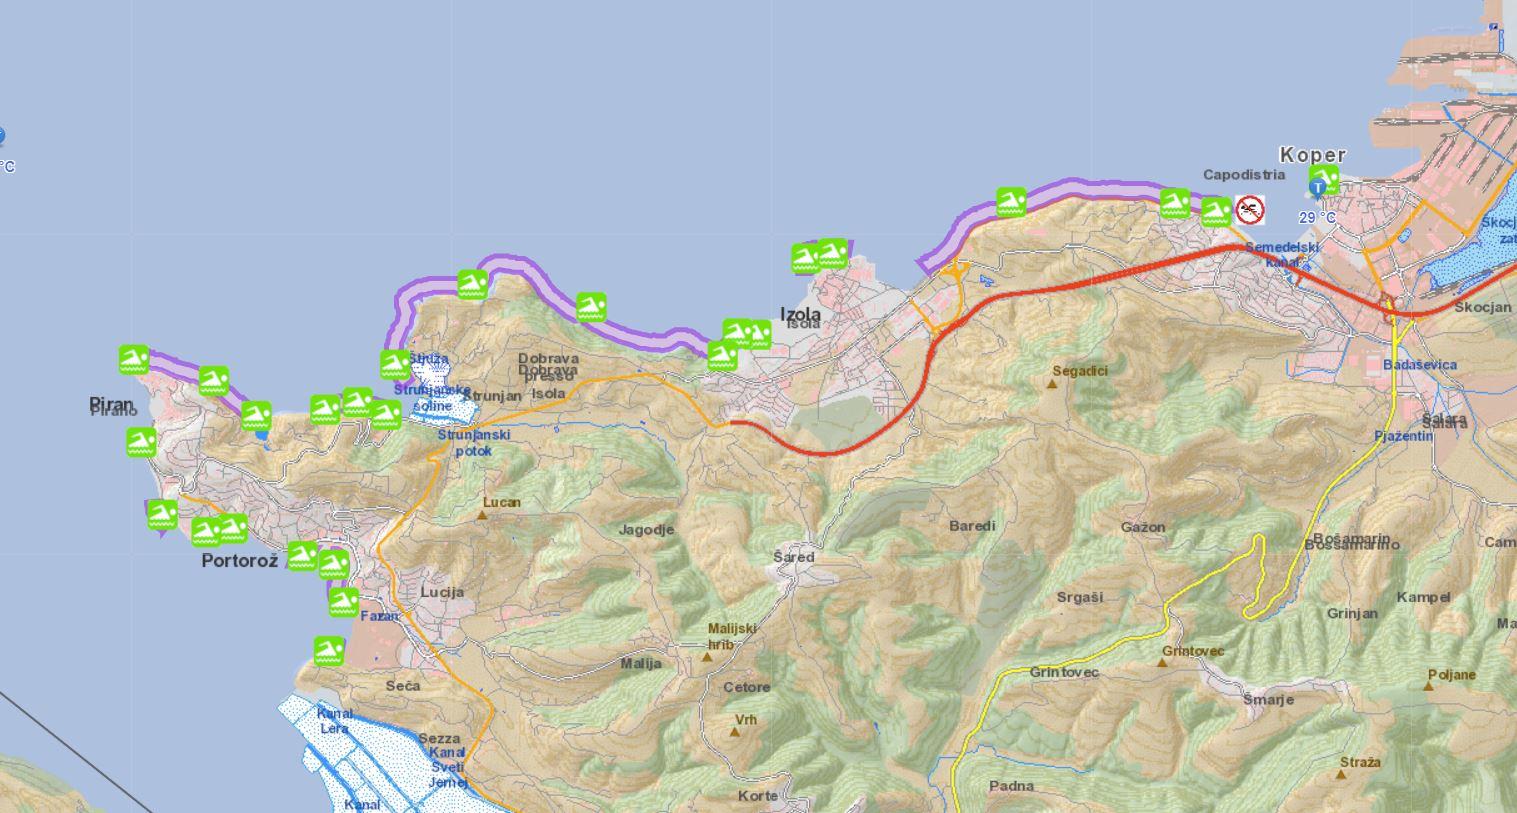 Interaktivna mapa kopališč